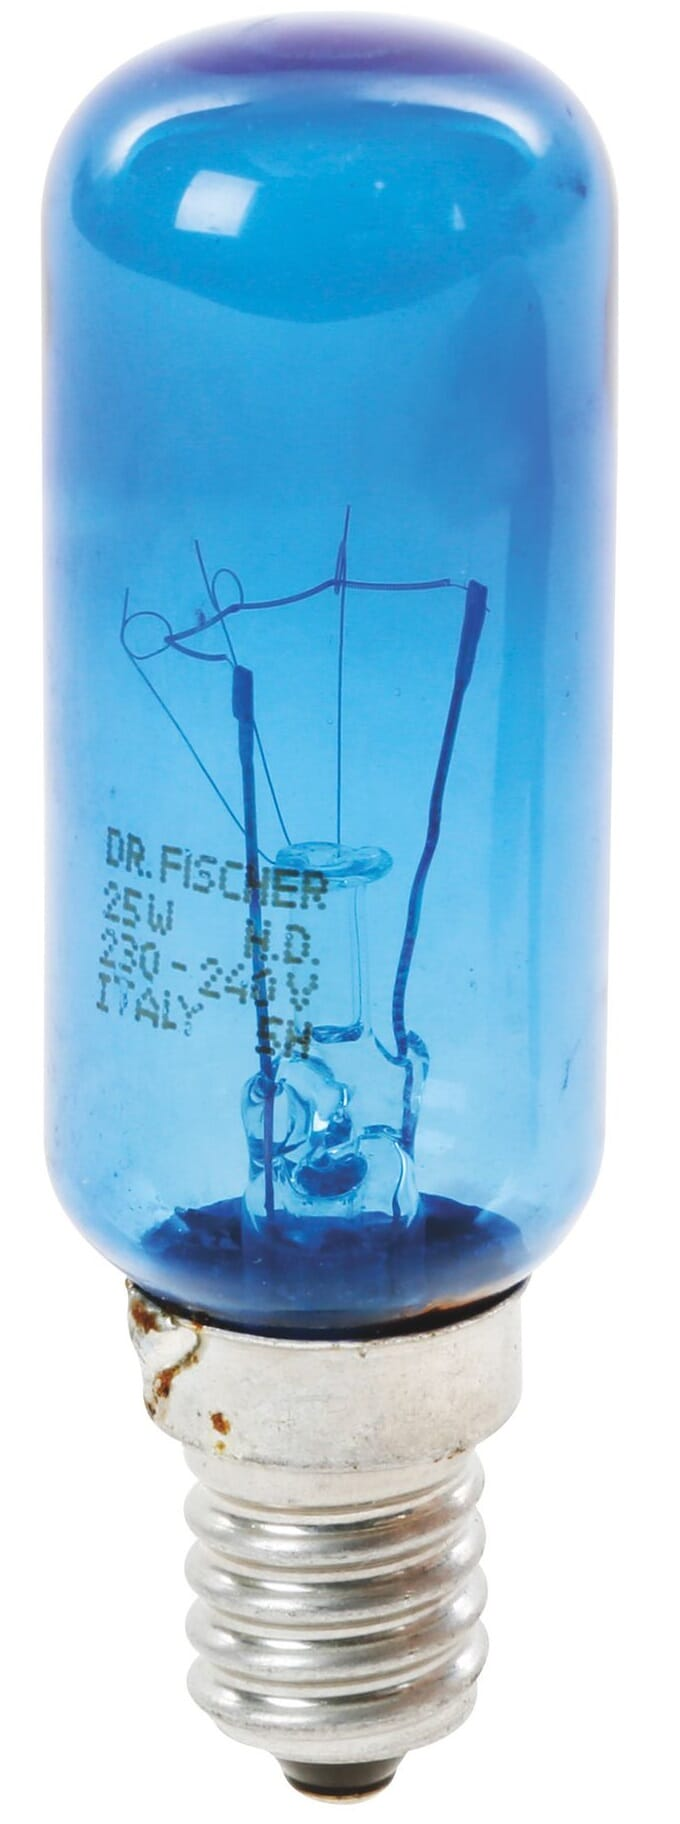 Kühlschrank Glühbirne 25w : Bosch siemens lampe w e twindis